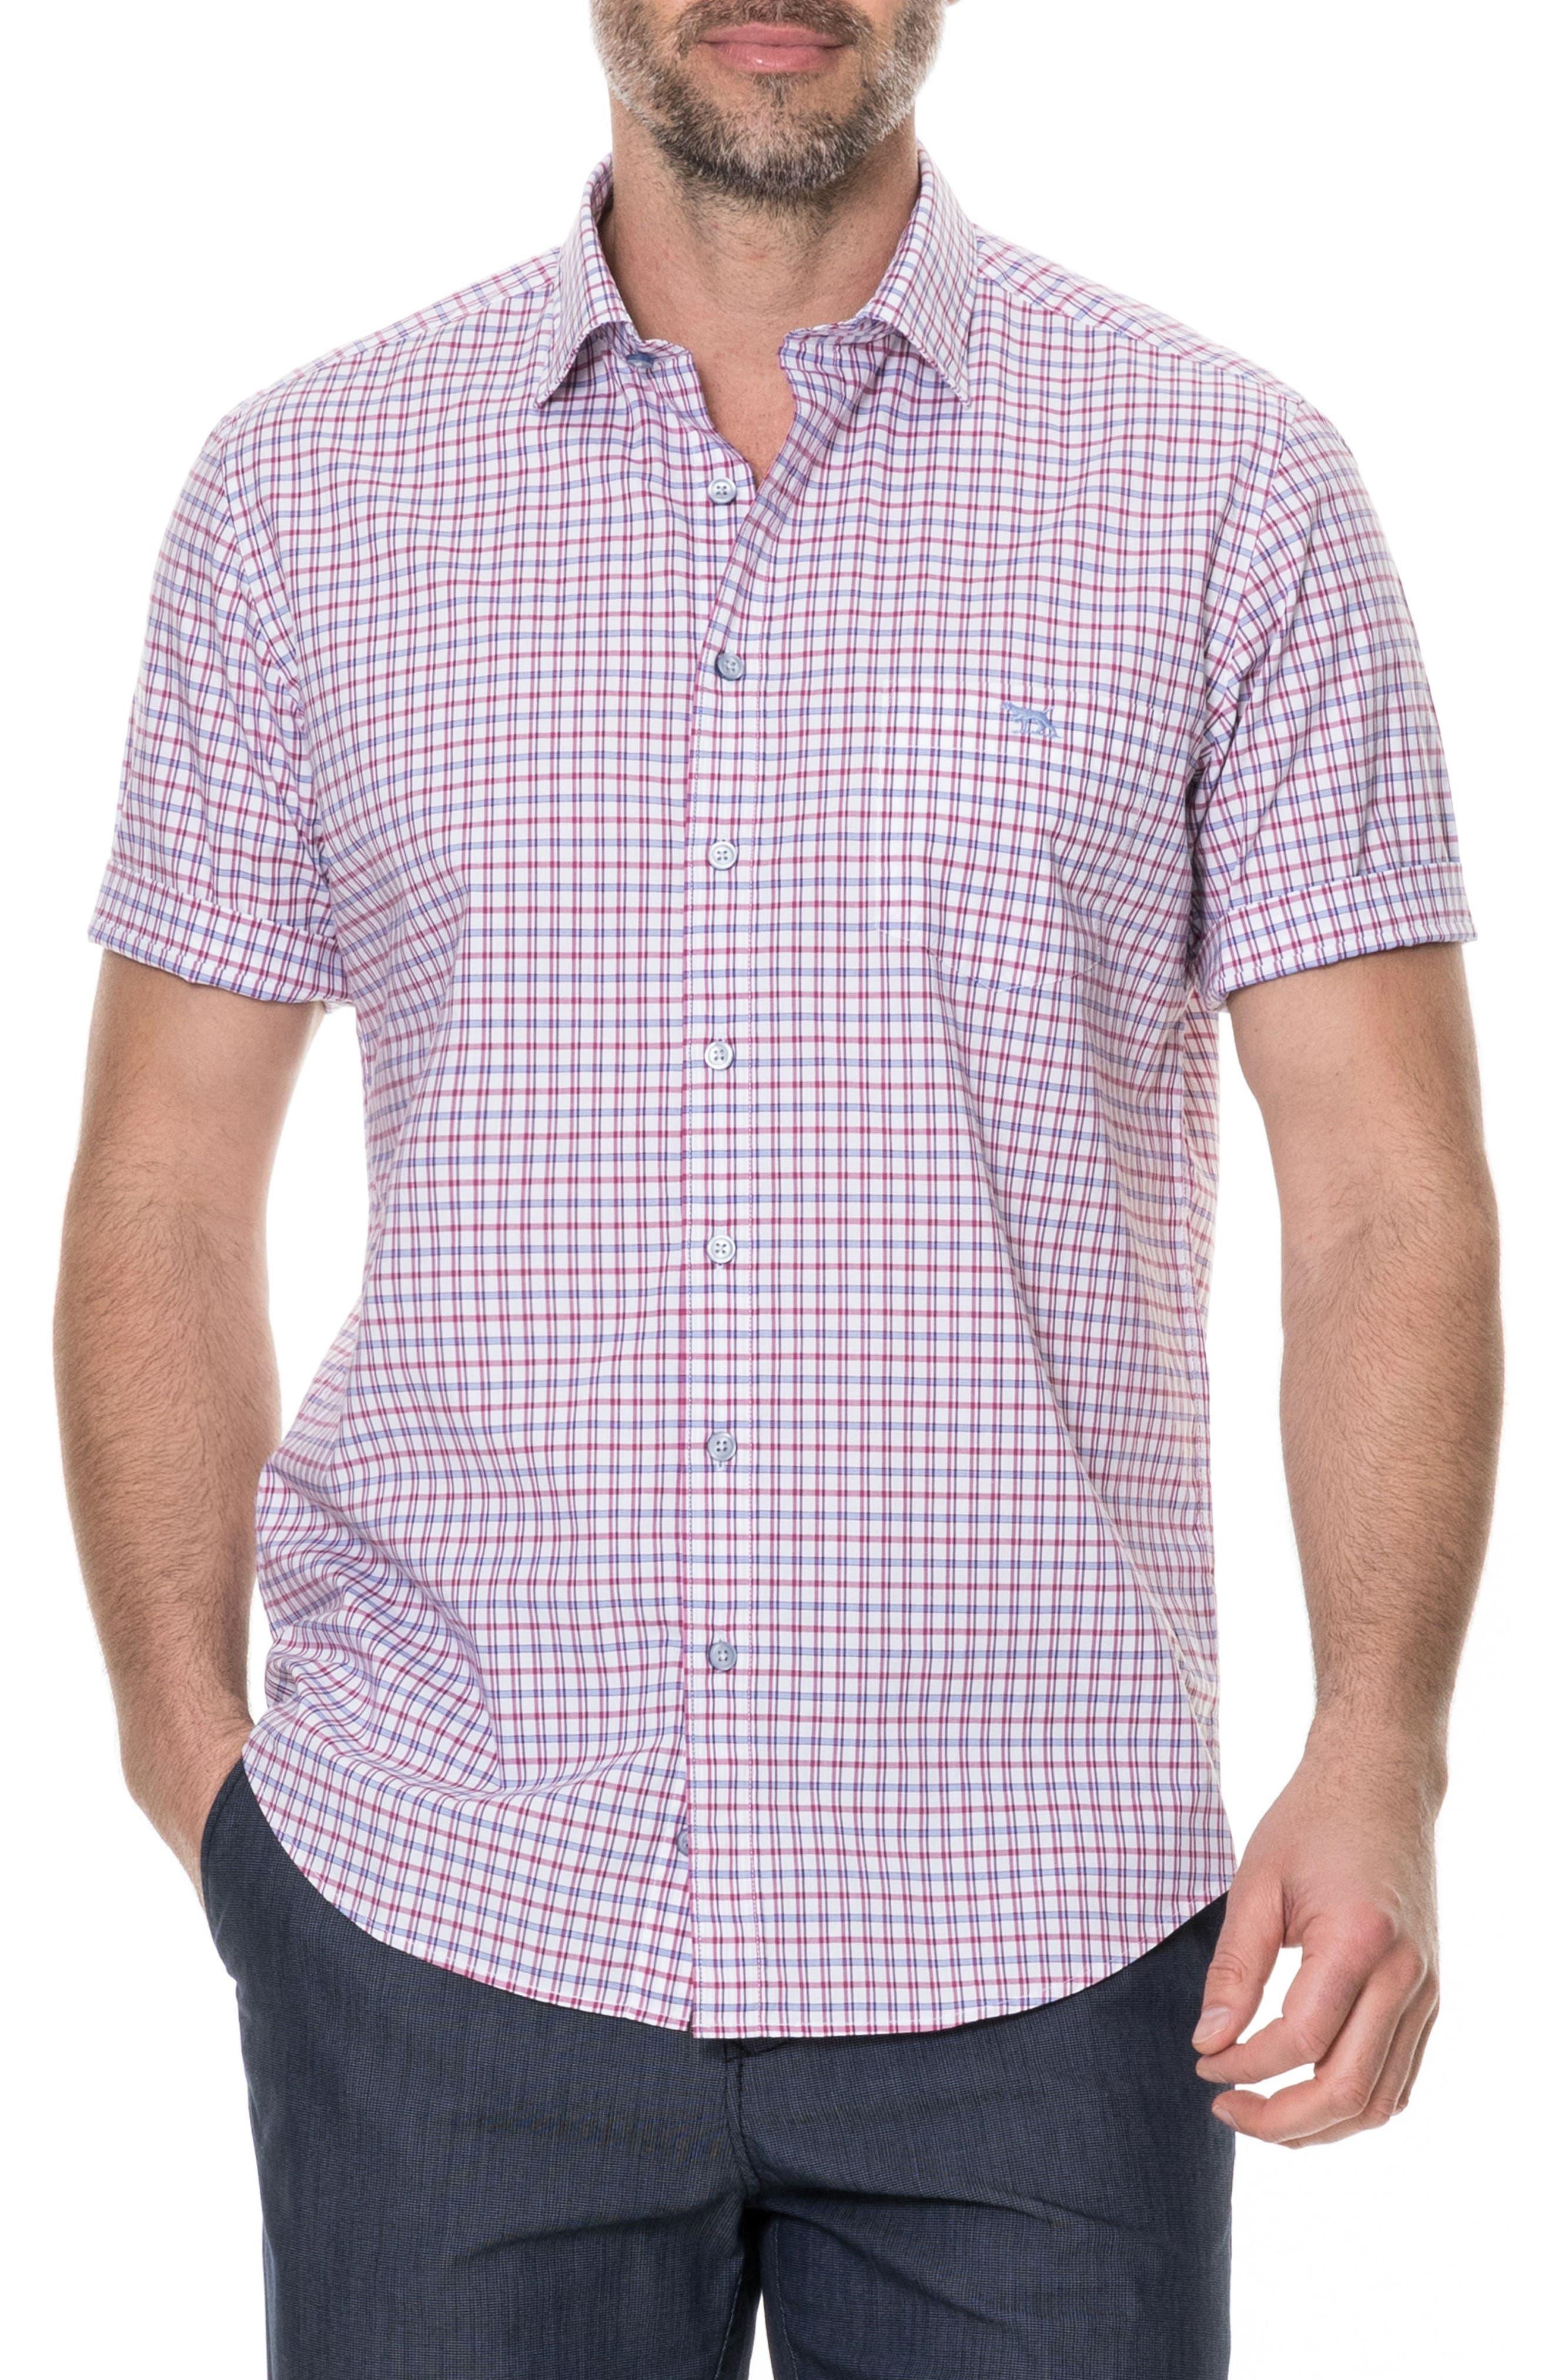 Waterford Regular Fit Sport Shirt,                             Main thumbnail 1, color,                             510